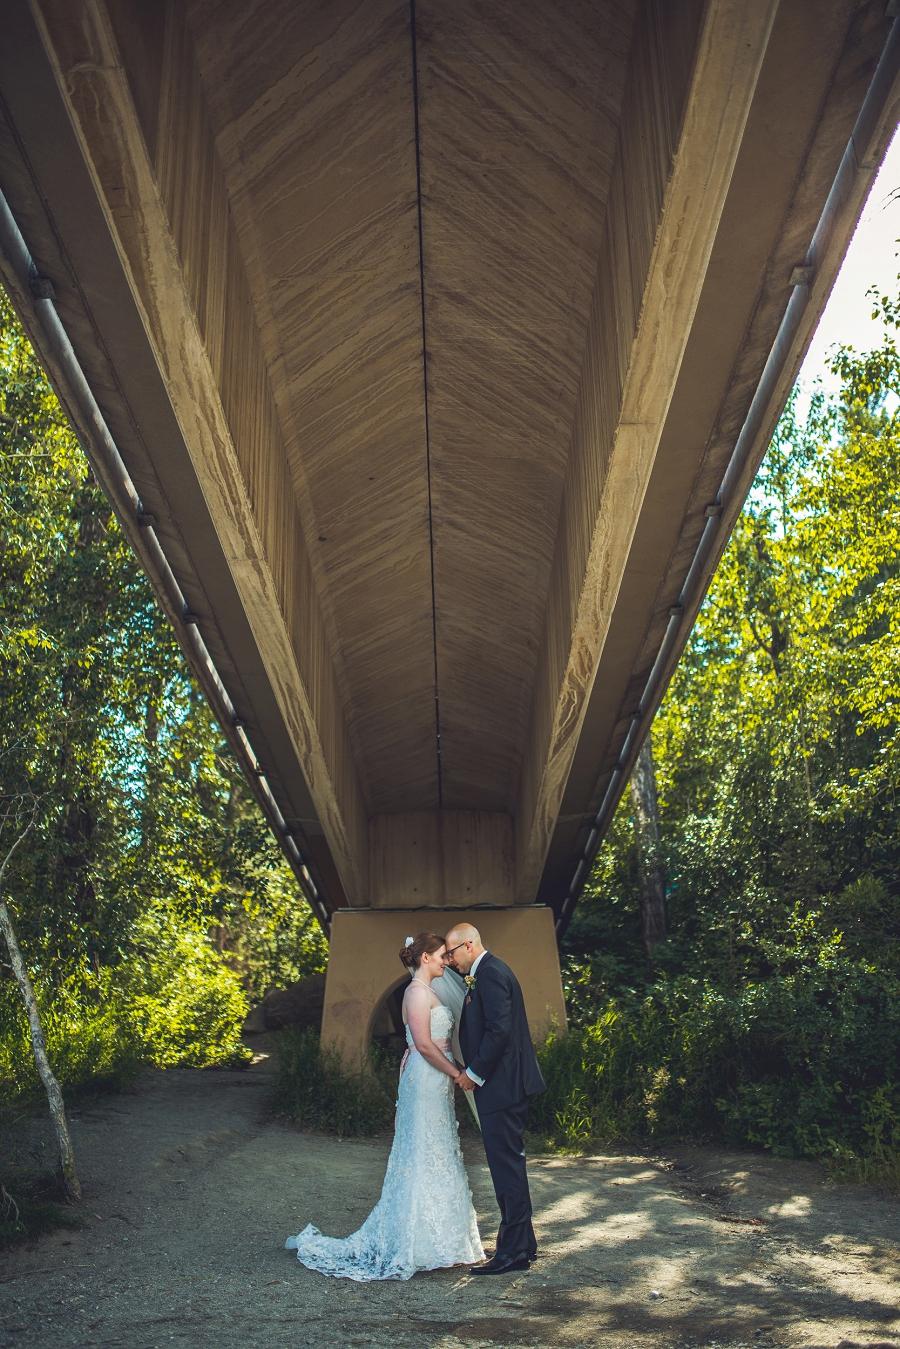 edworthy park calgary wedding photographers anna michalska bride groom under bridge